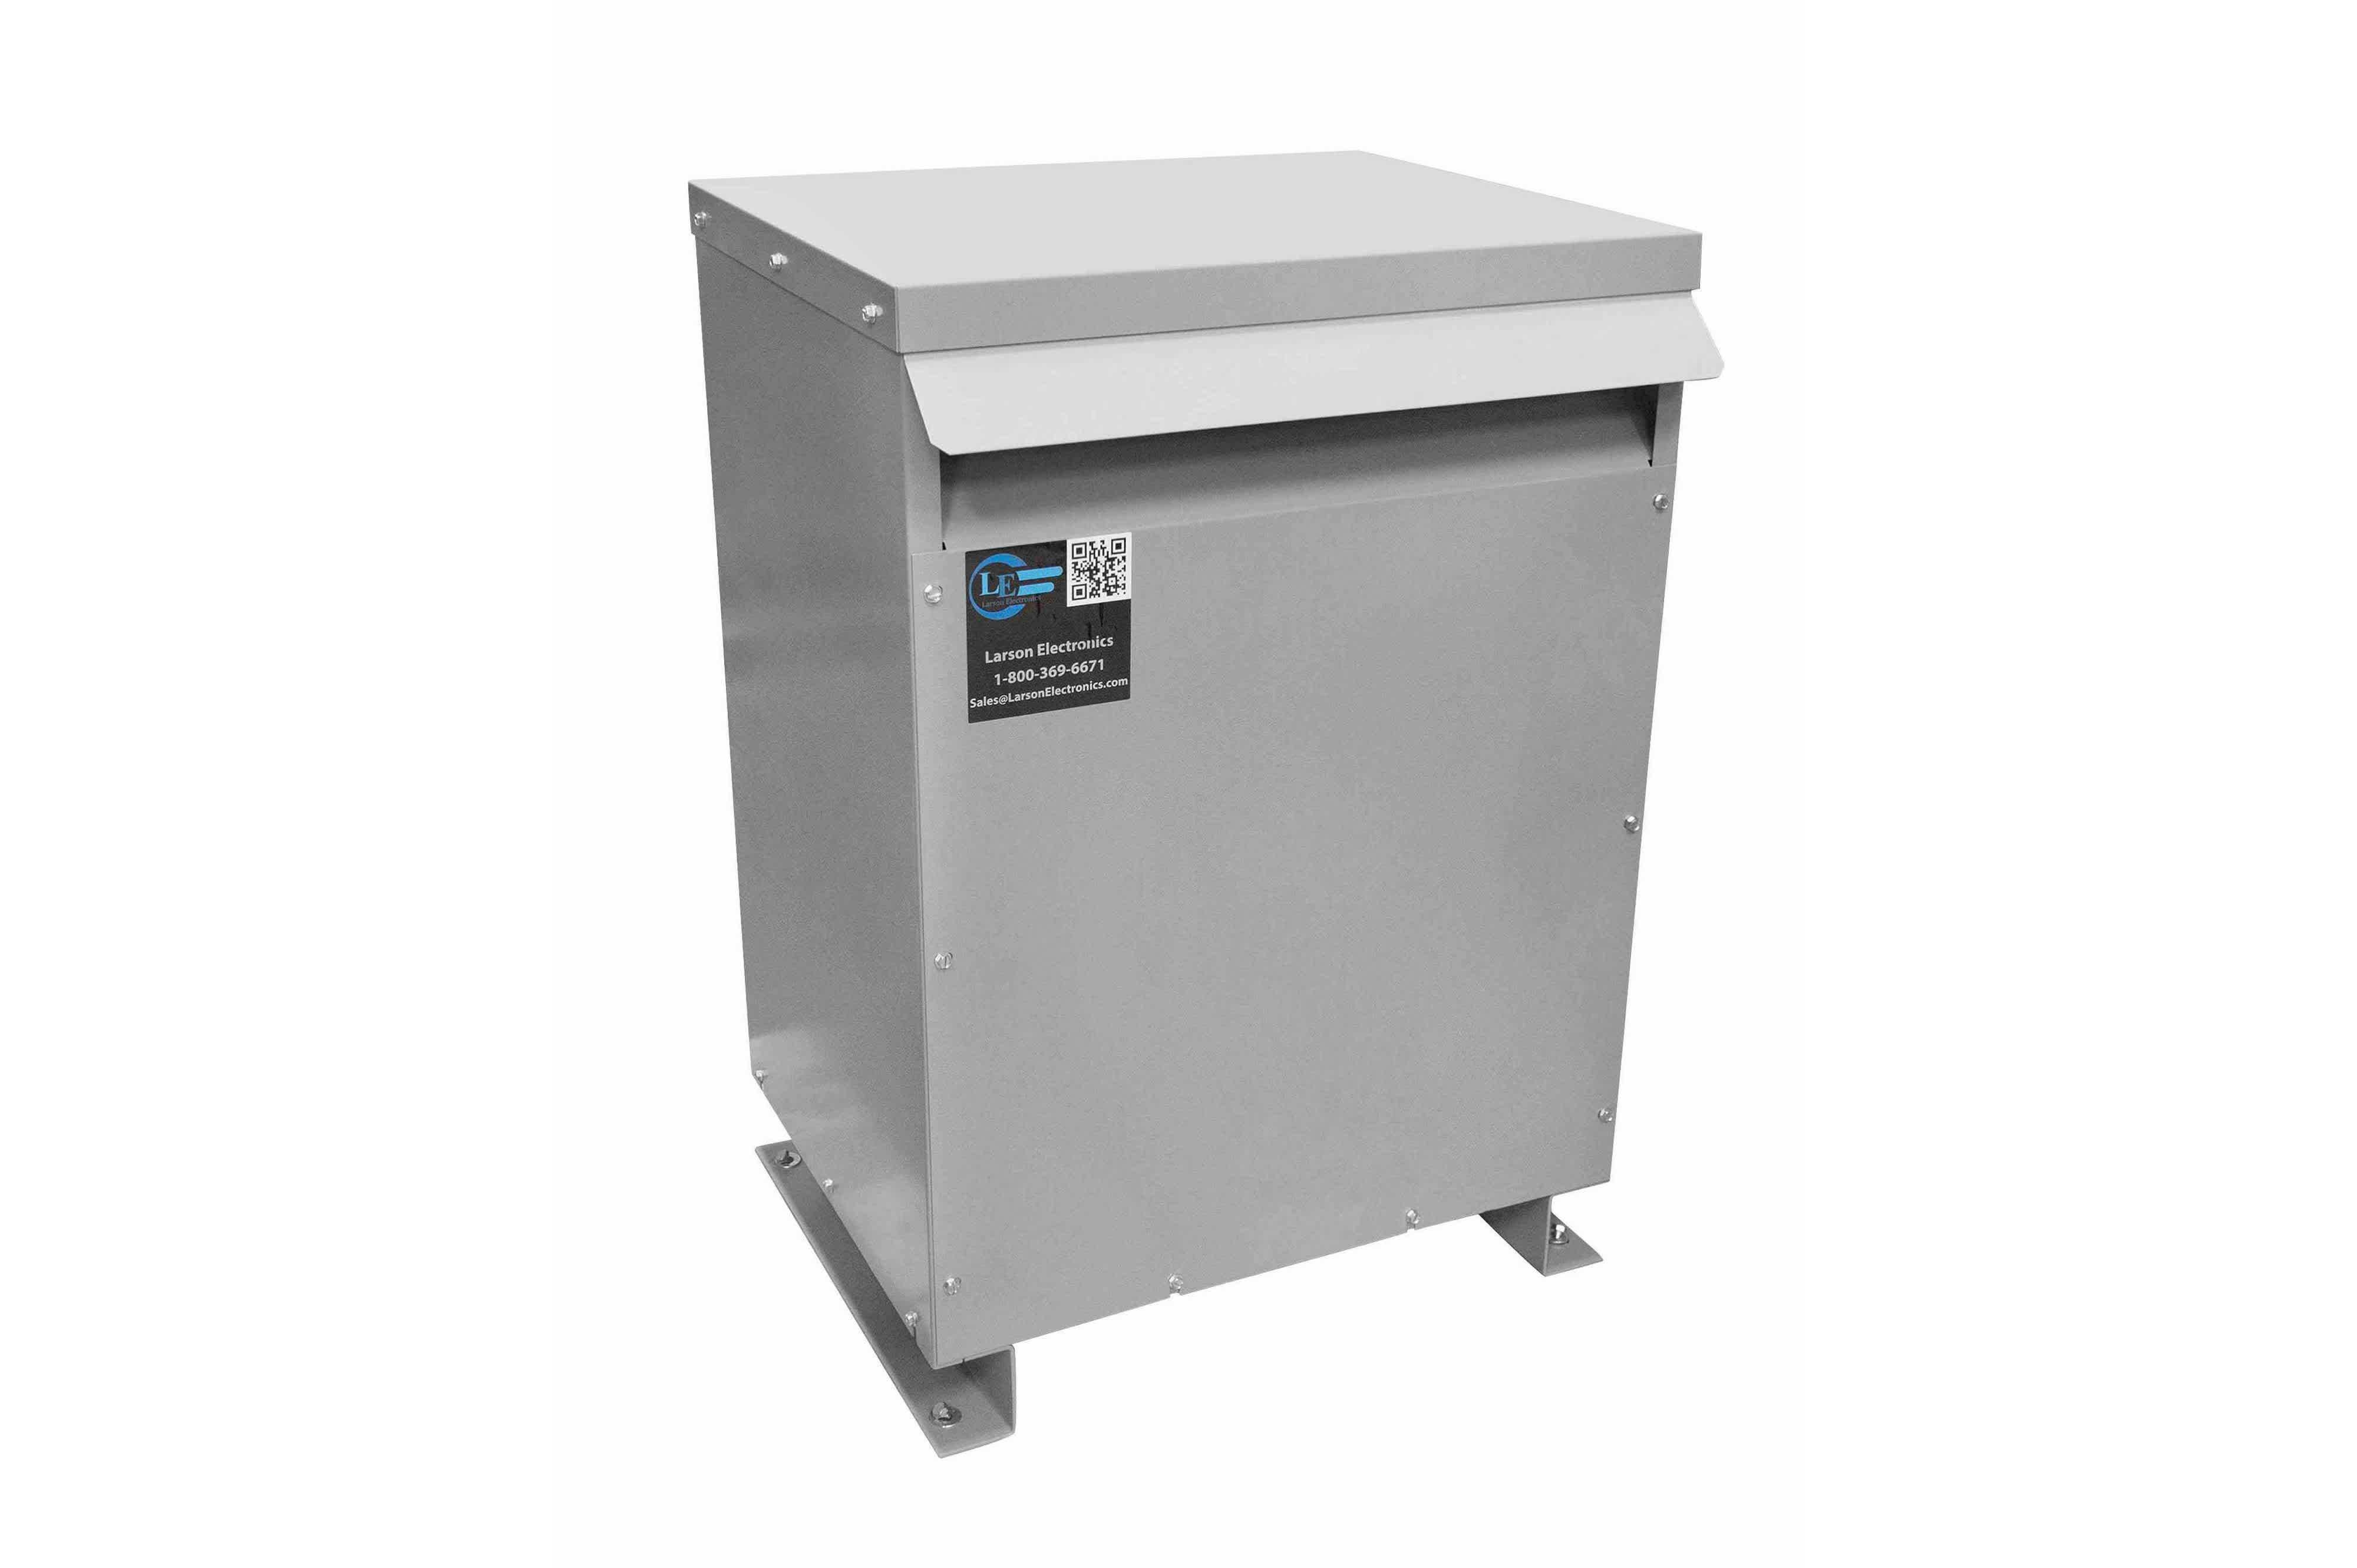 237.5 kVA 3PH Isolation Transformer, 575V Wye Primary, 240V Delta Secondary, N3R, Ventilated, 60 Hz